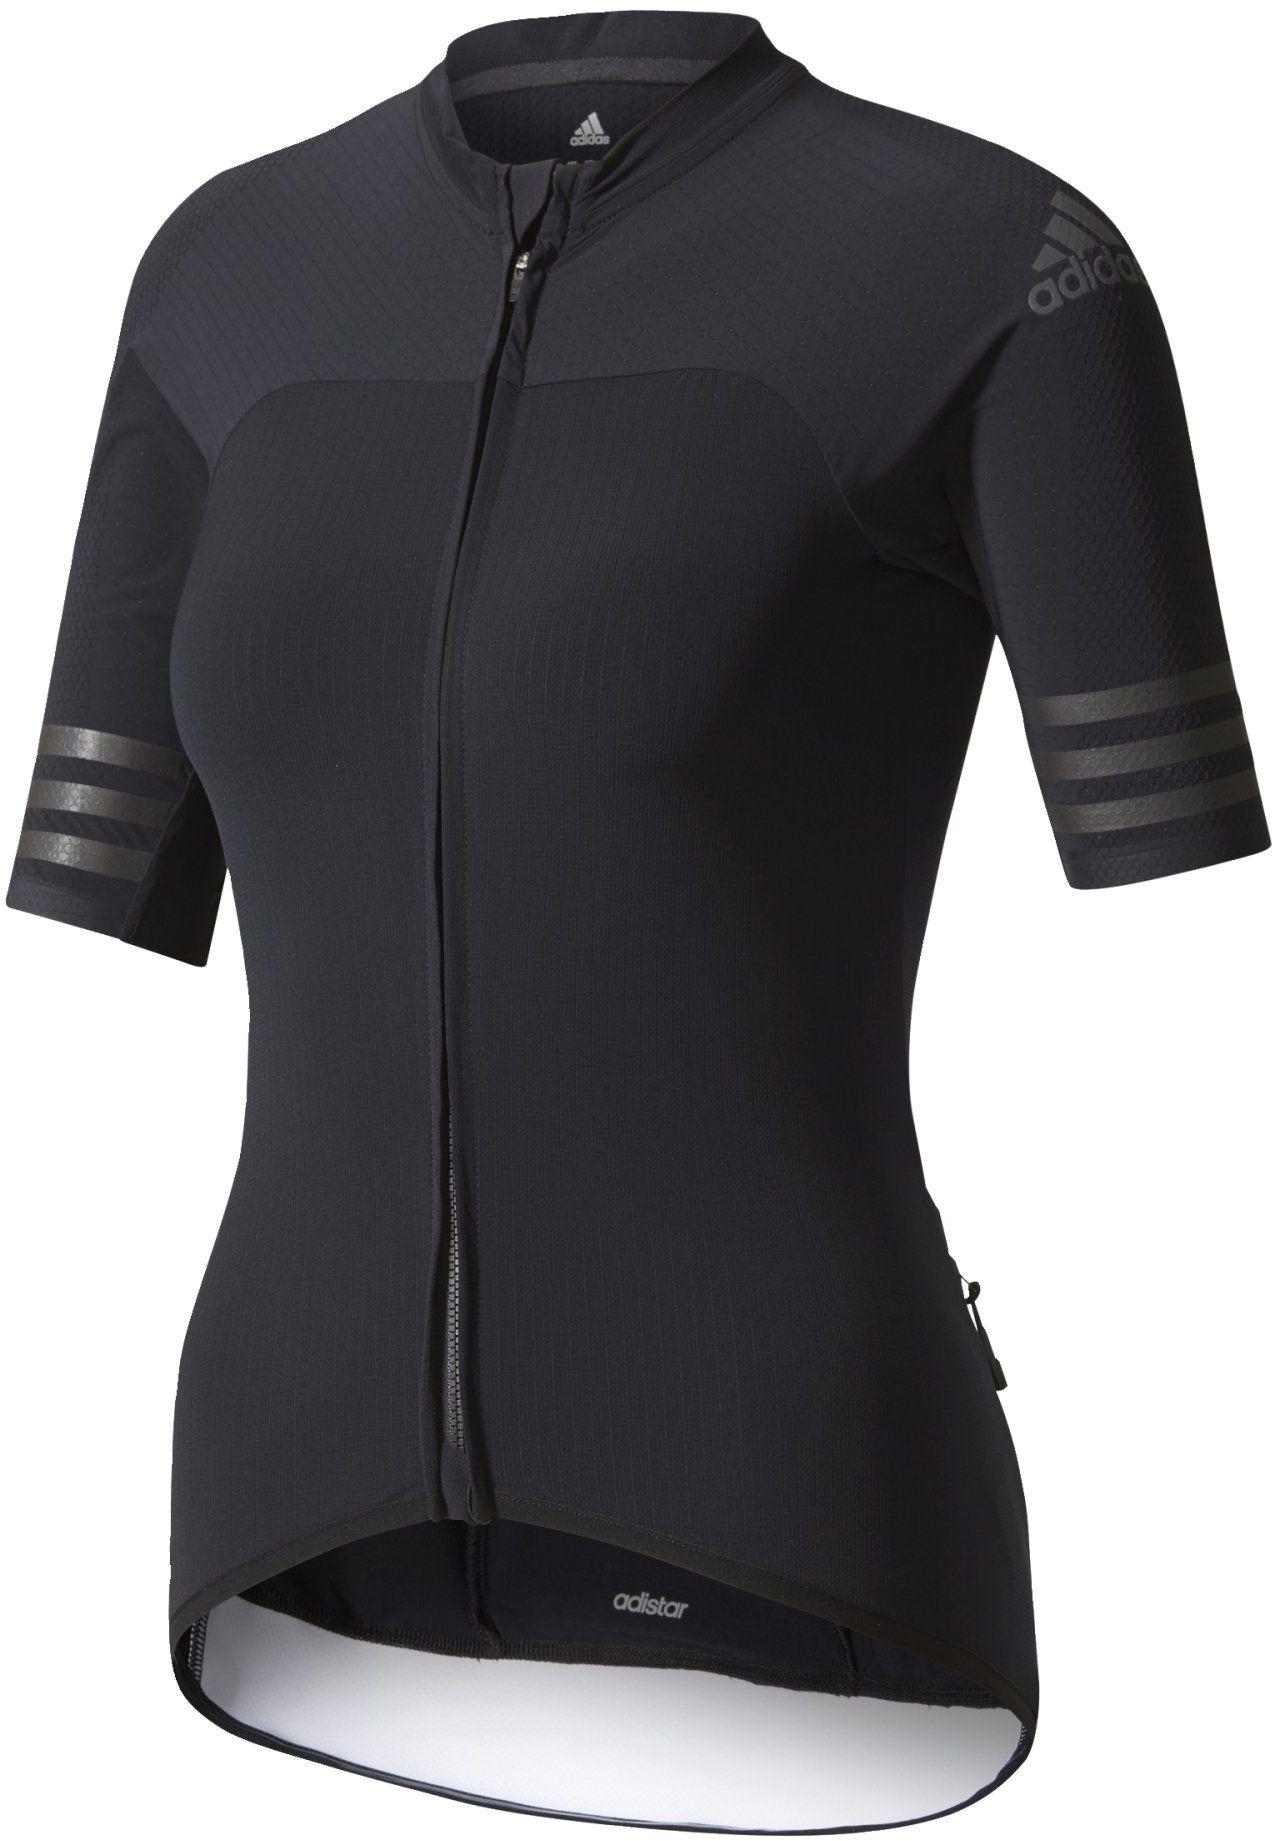 adidas damska koszulka piłkarska Adistar Engineered Woven czarny Black/Blkref S